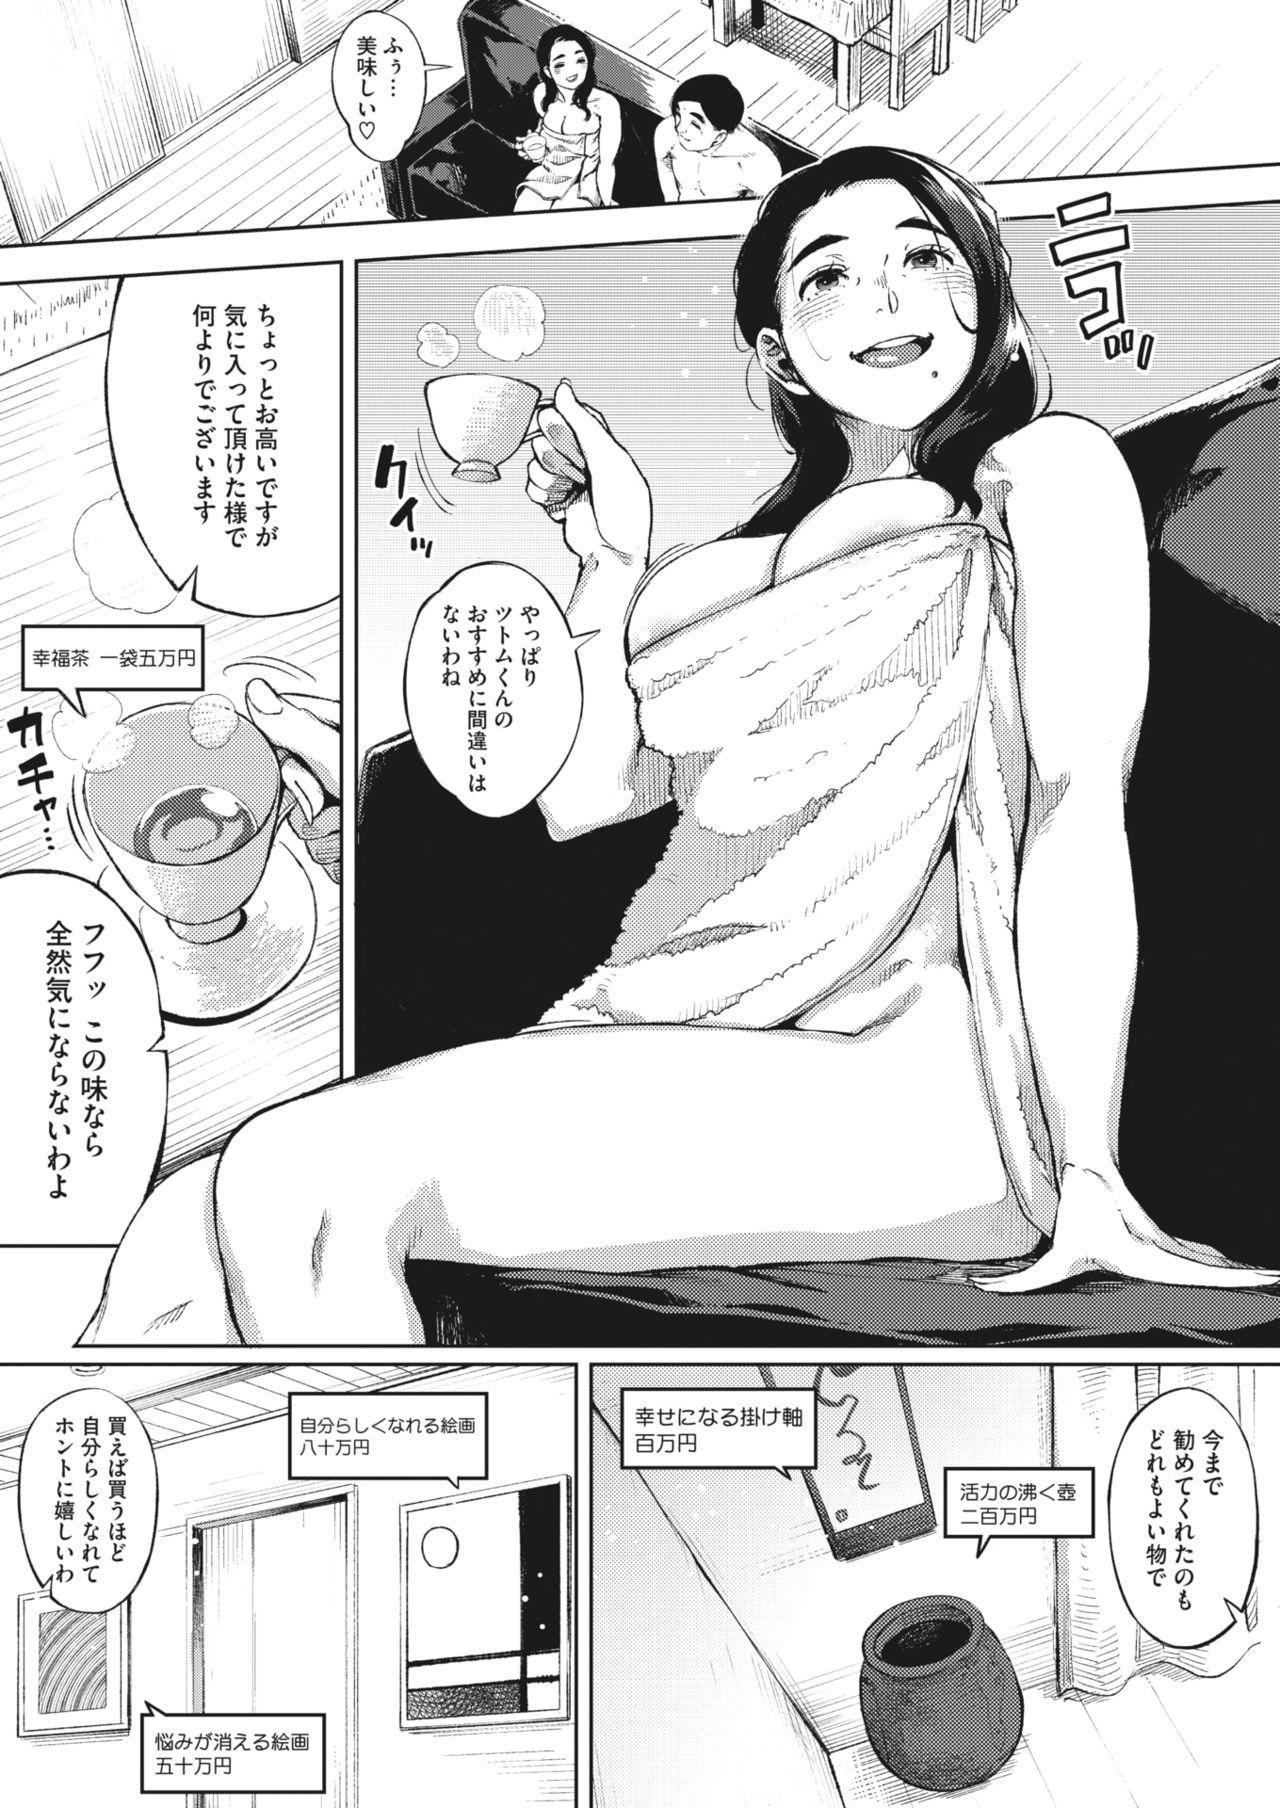 COMIC HOTMiLK Koime Vol. 22 15